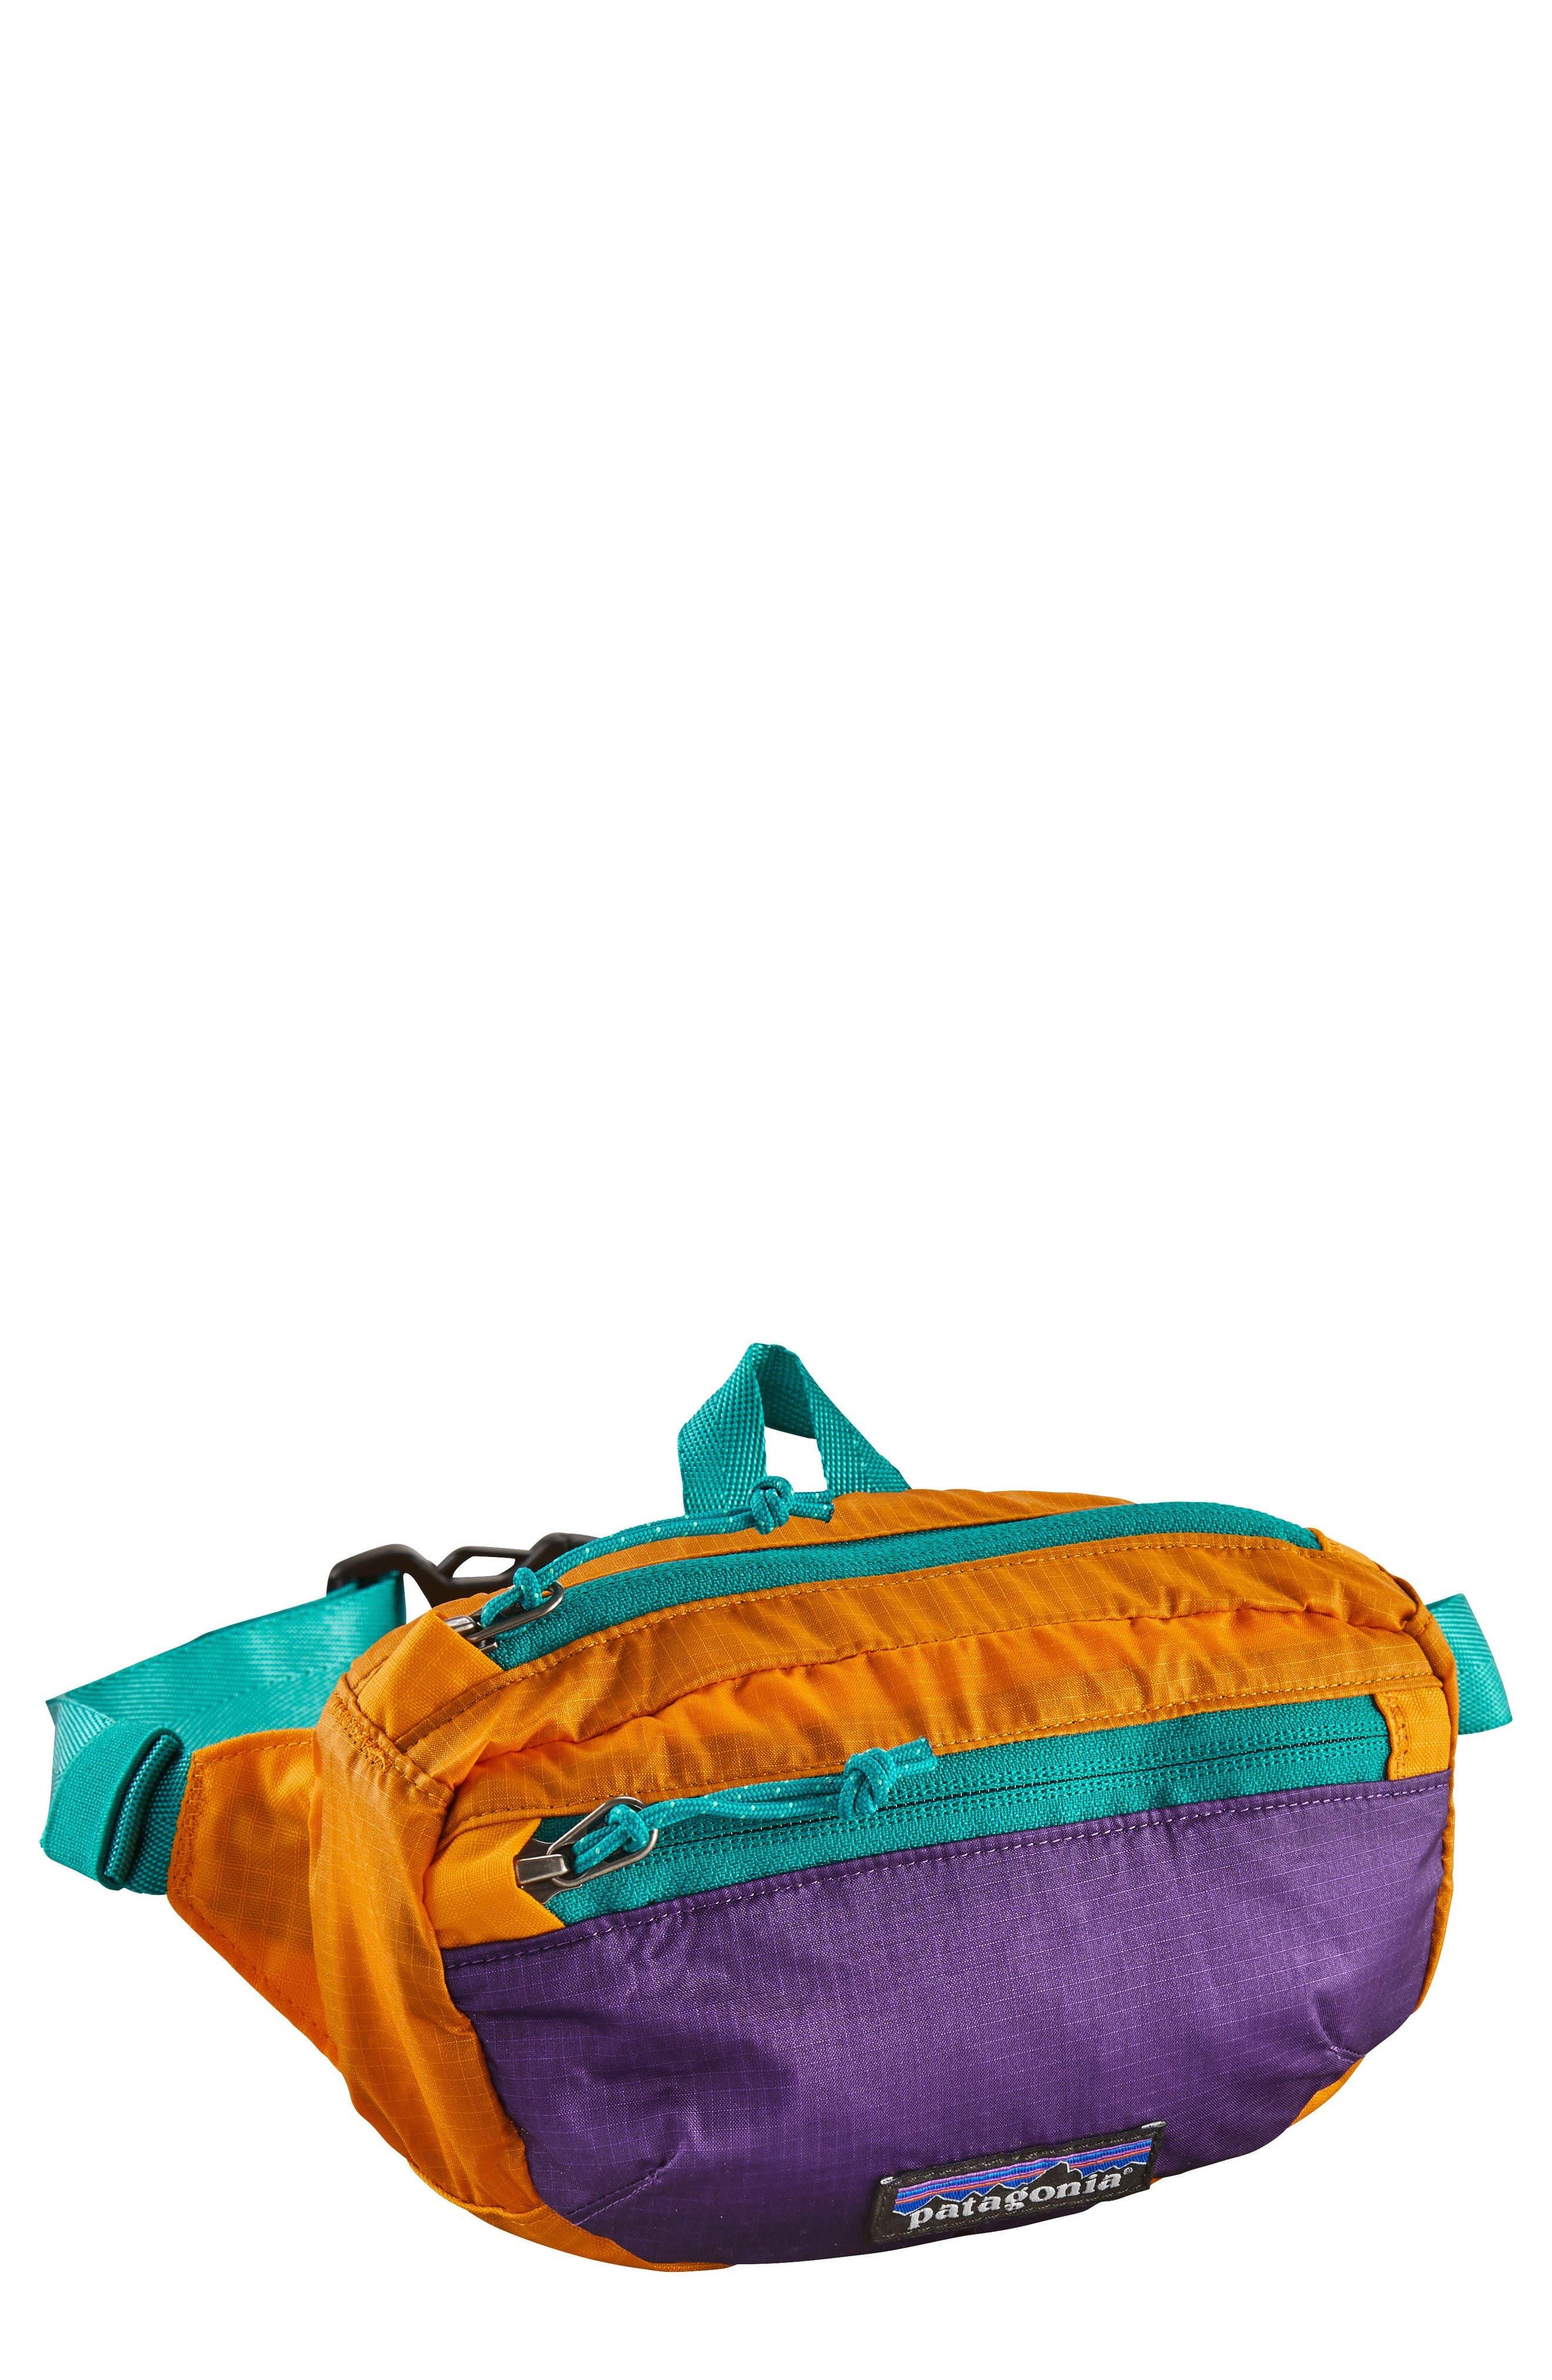 Main Image - Patagonia Travel Belt Bag